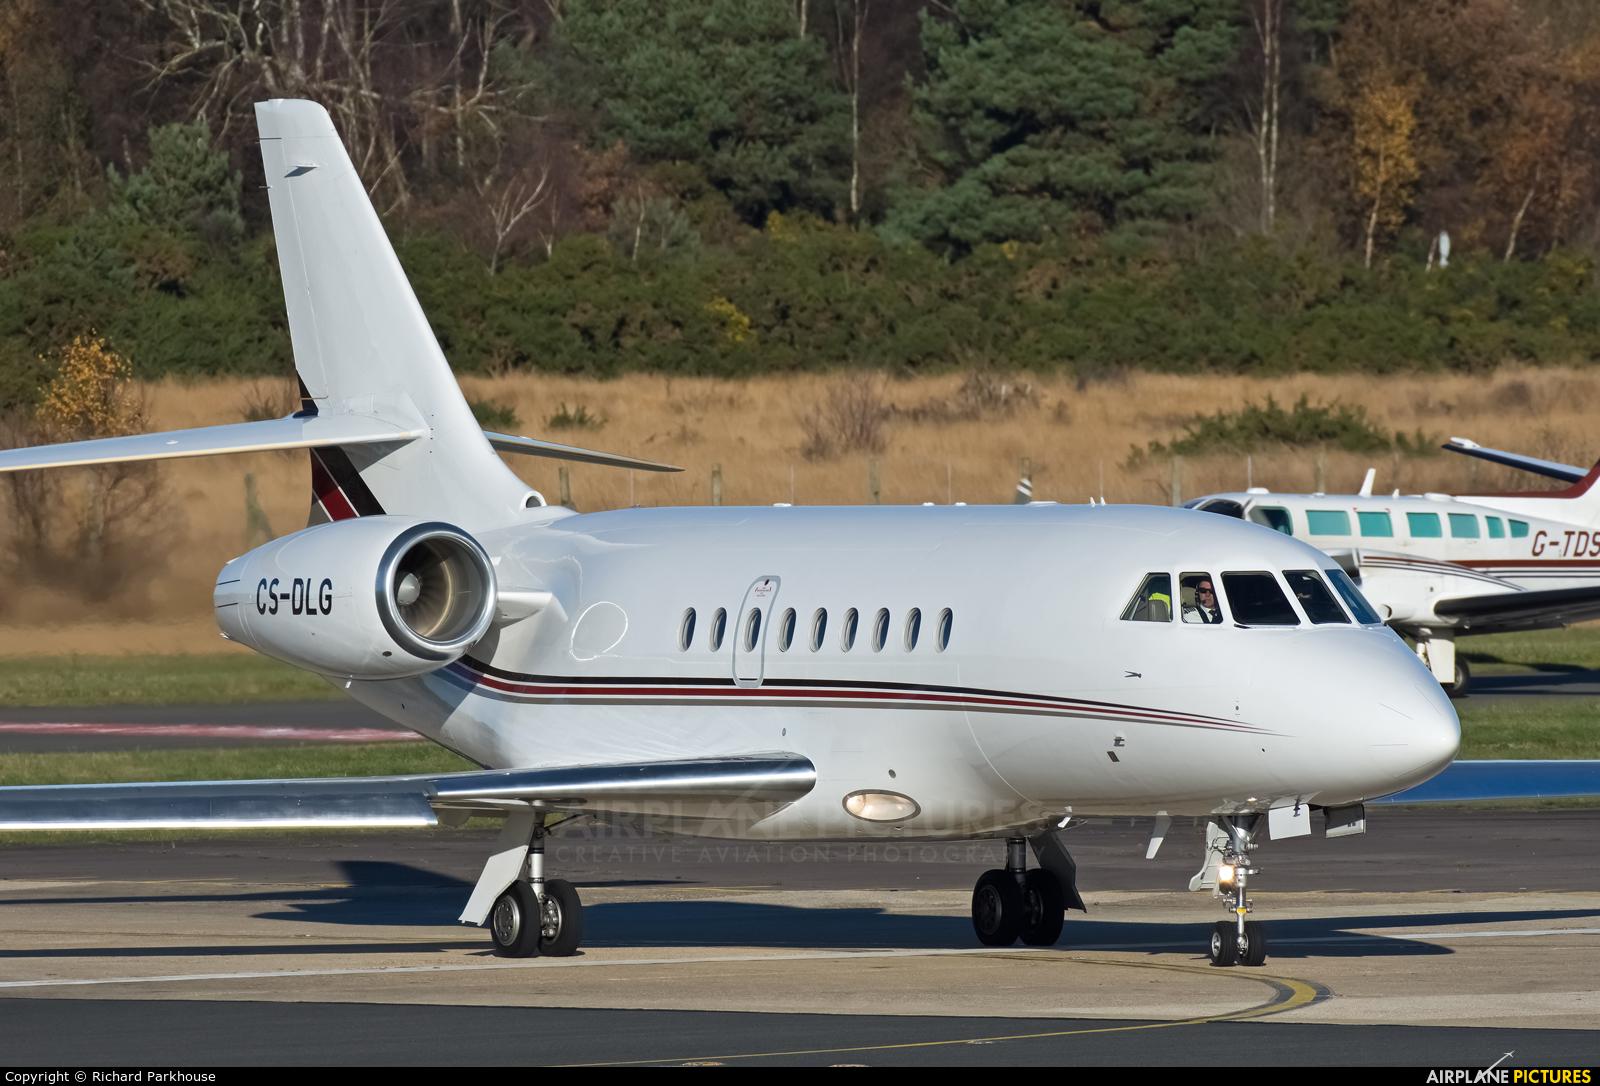 NetJets Europe (Portugal) CS-DLG aircraft at Farnborough